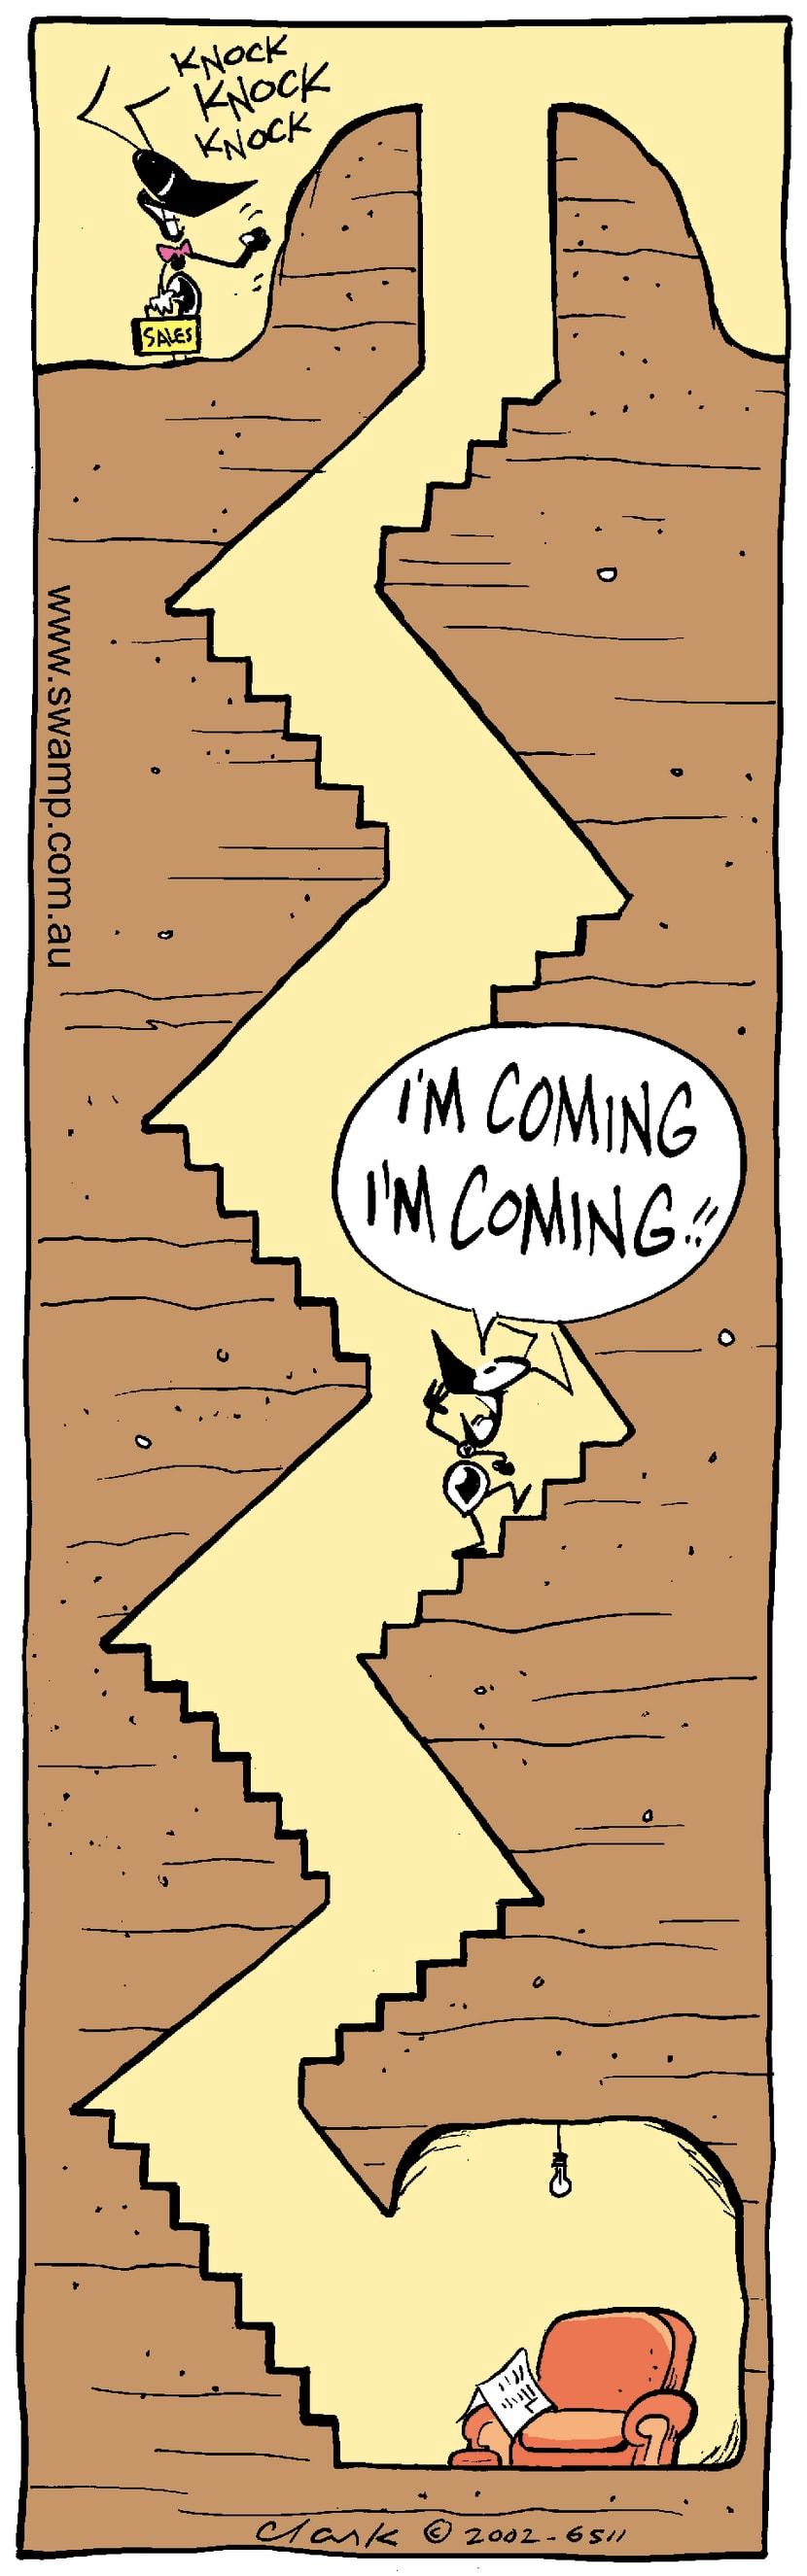 Swamp Cartoon - Knock KnockJuly 30, 2002